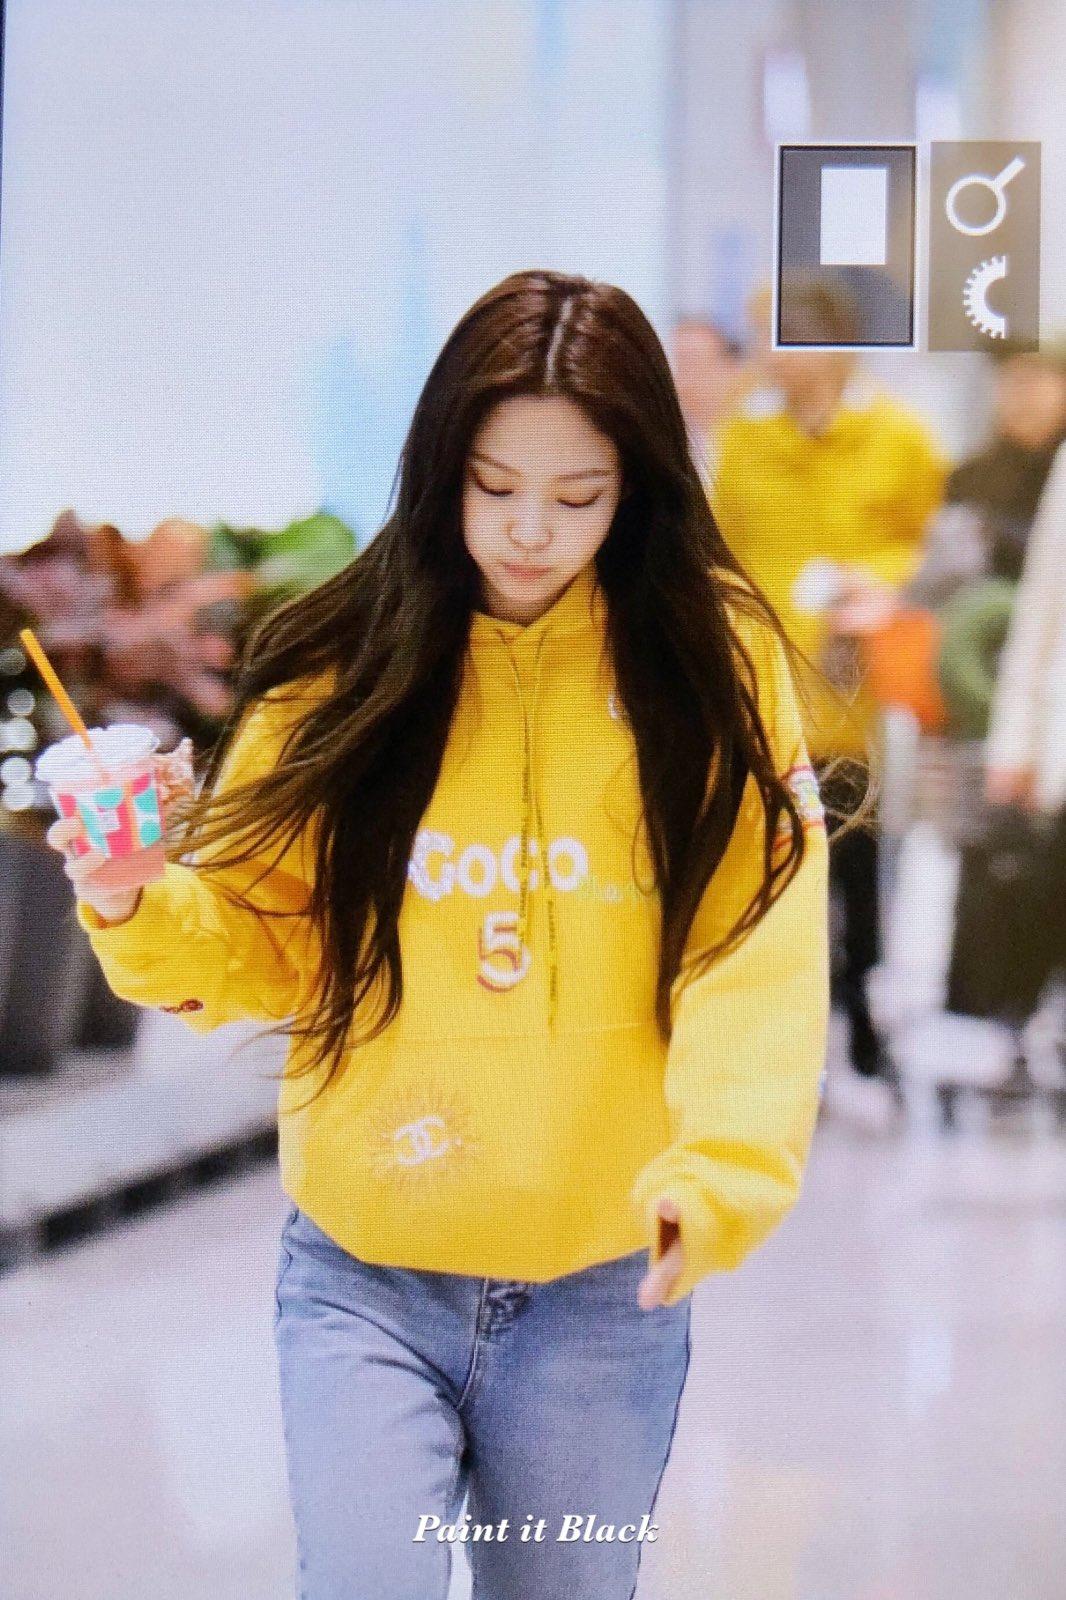 73 Blackpink Jennie Airport Photo 9 April 2019 Incheon To Thailand